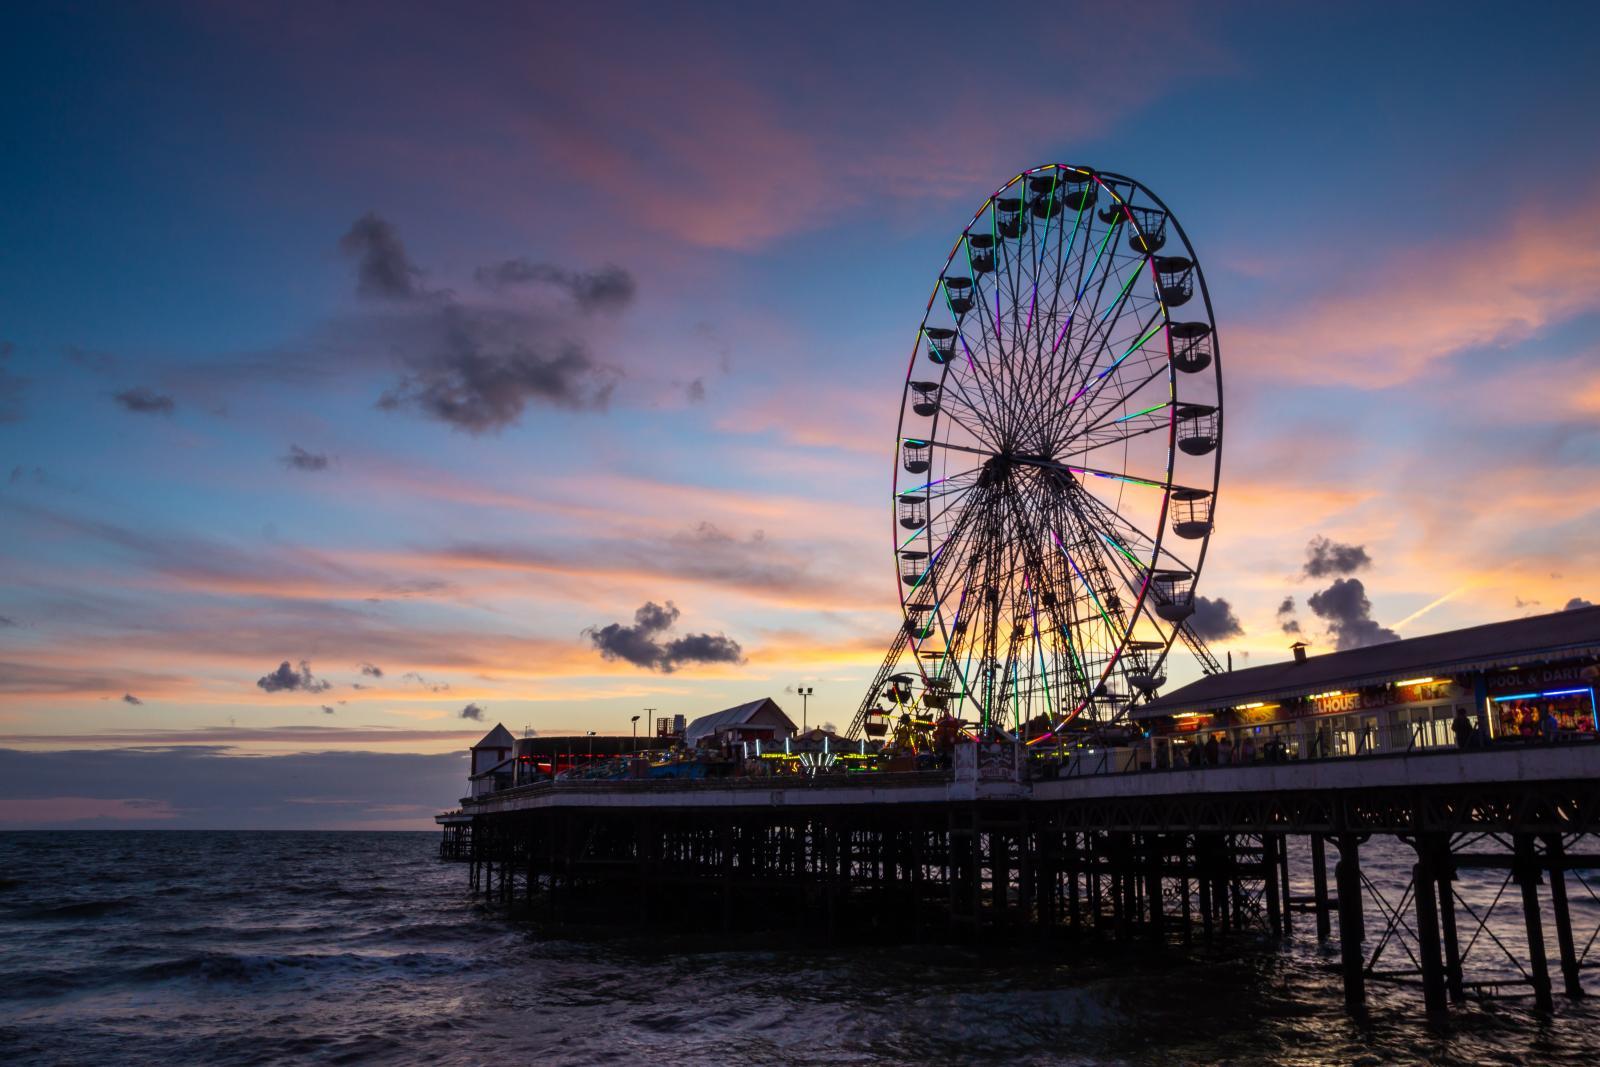 Blackpool illuminations and Pleasure beach weather